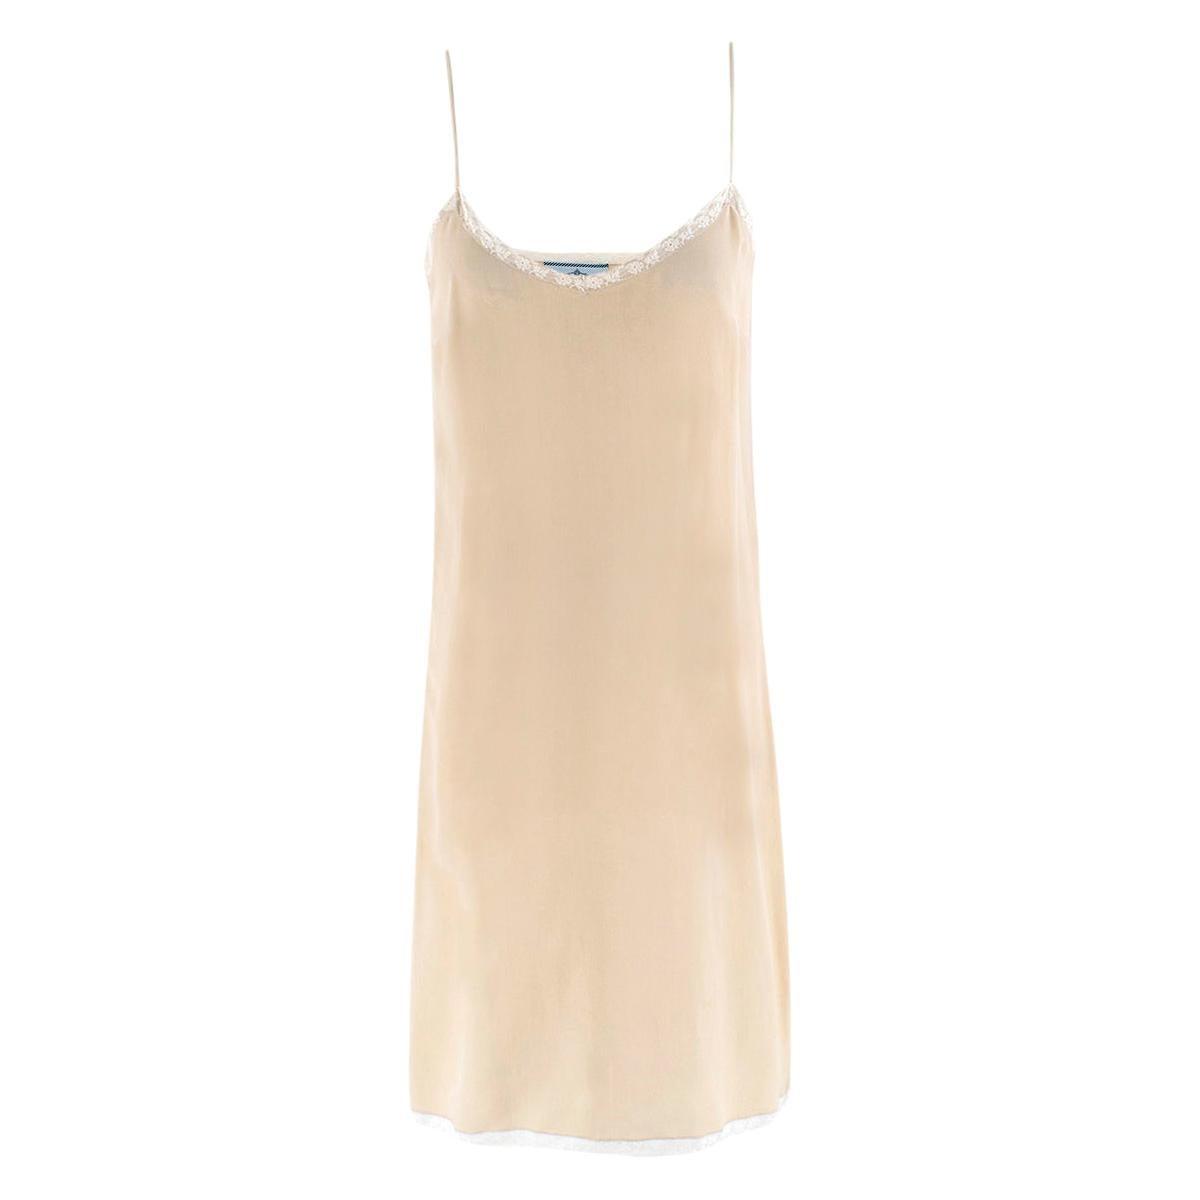 Prada Silk Blend Nude Mini Slip Dress - Size US 2